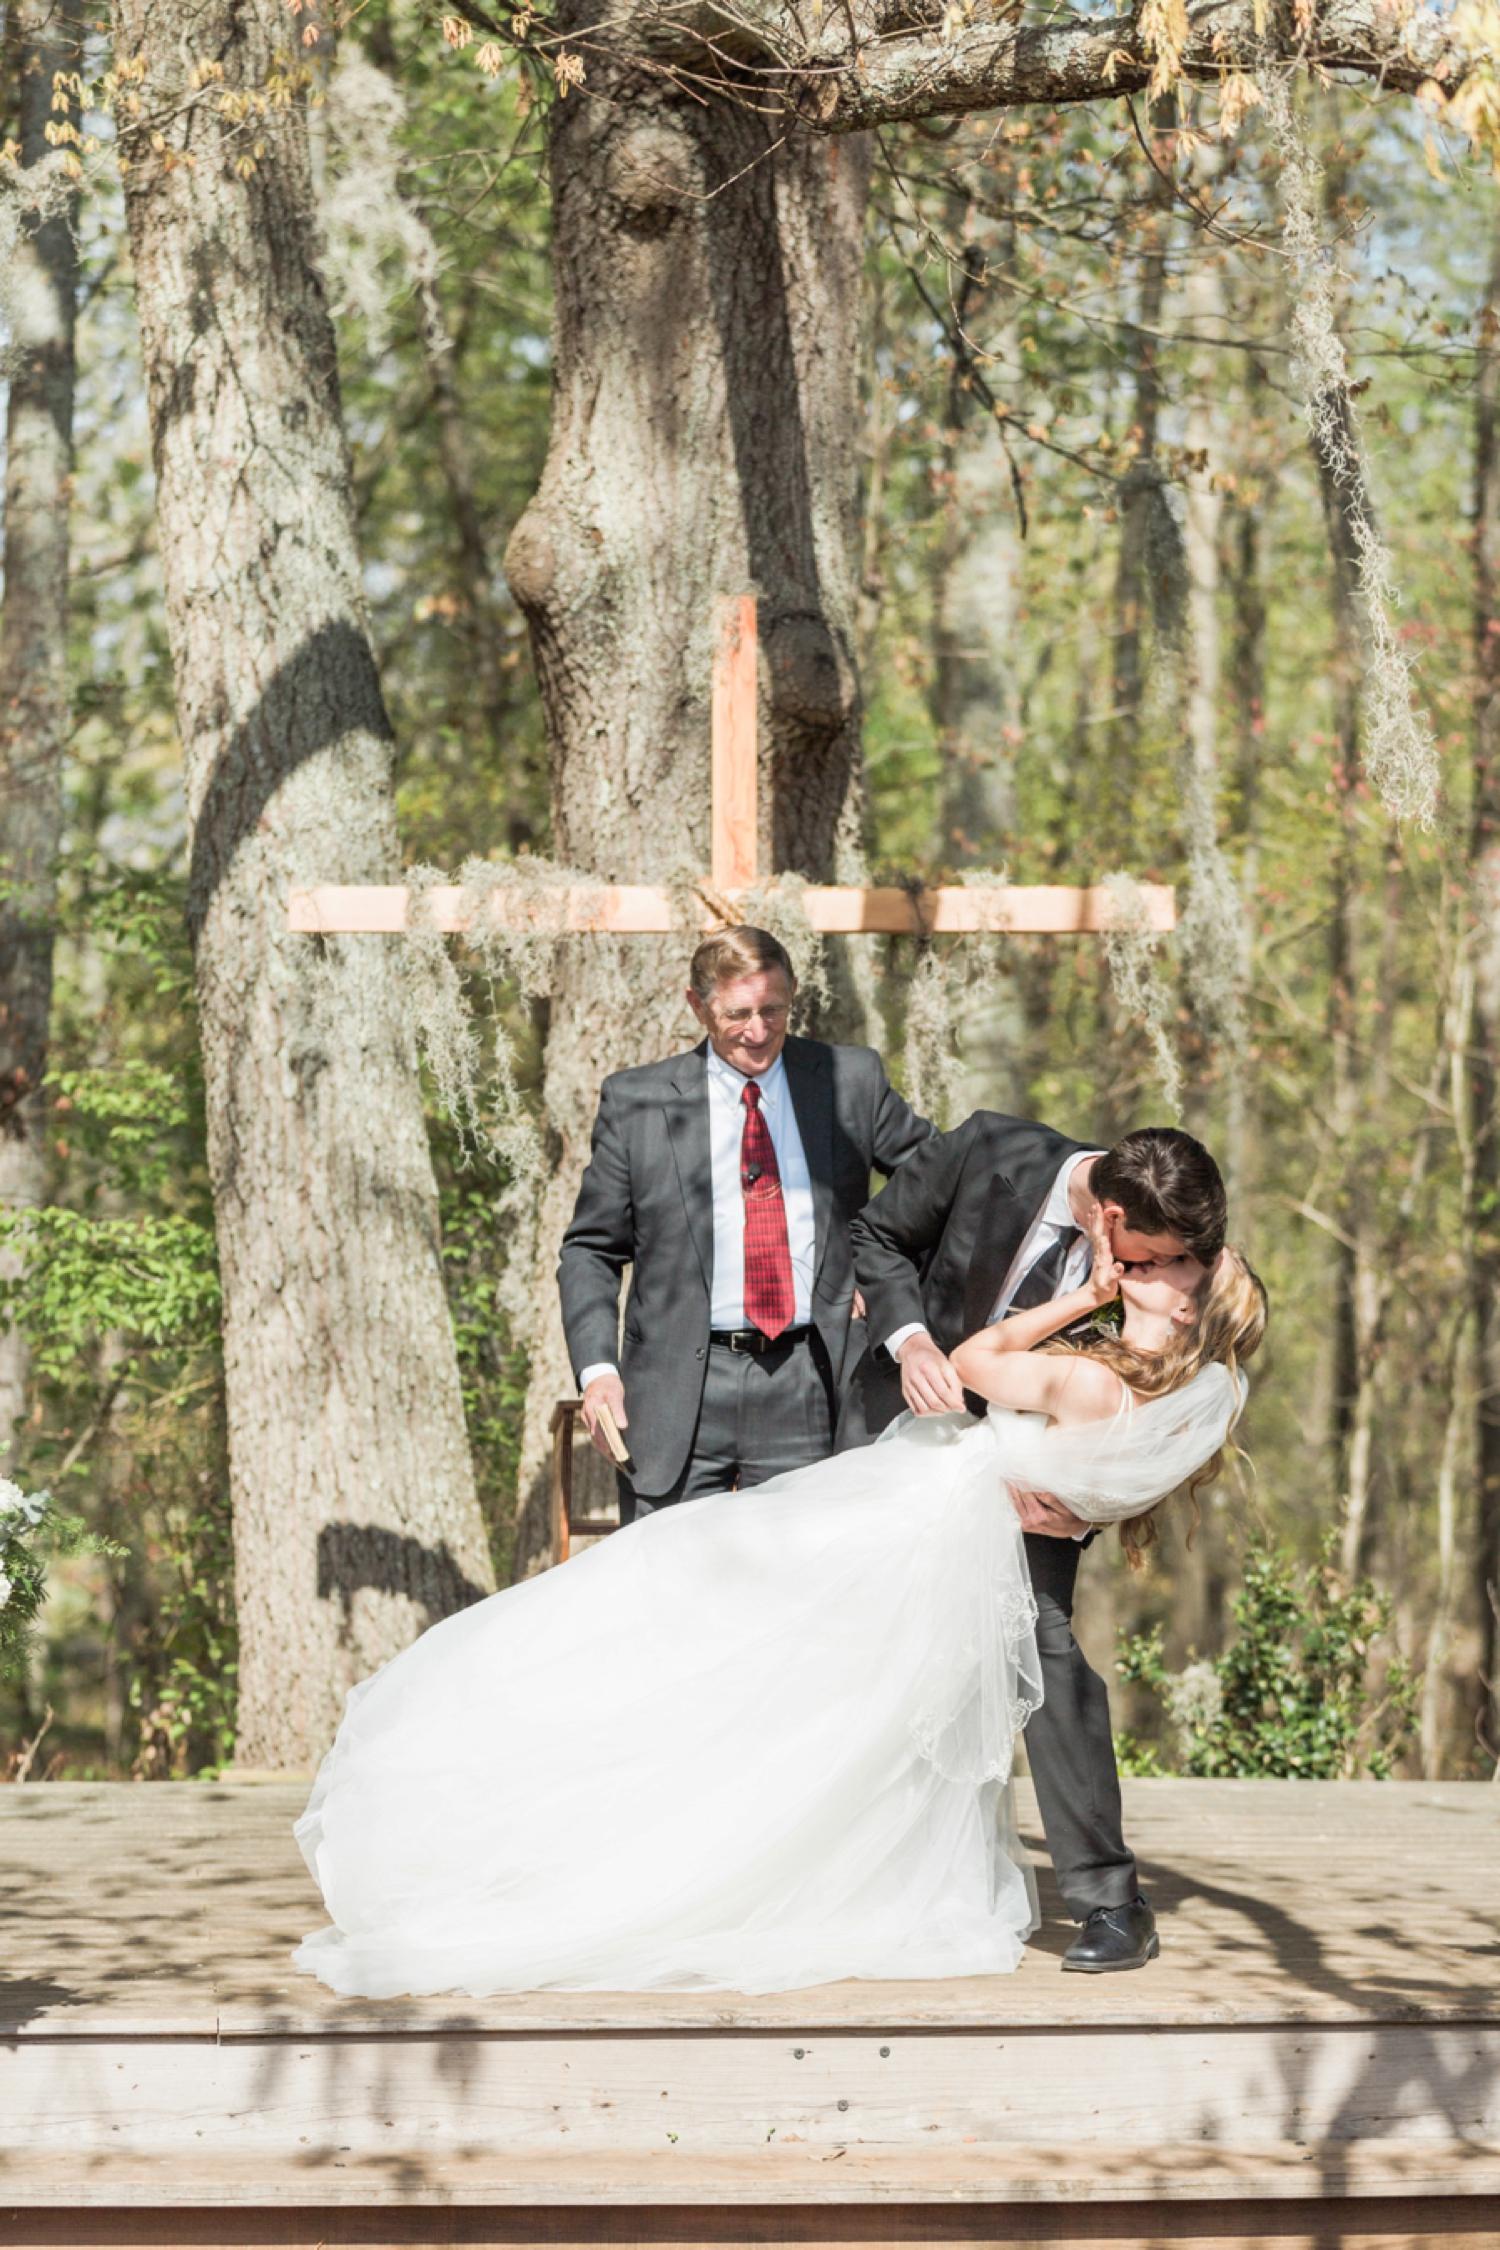 fine-art-film-charleston-south-carolina-wedding-photographer-atlanta-georgia_3443.jpg